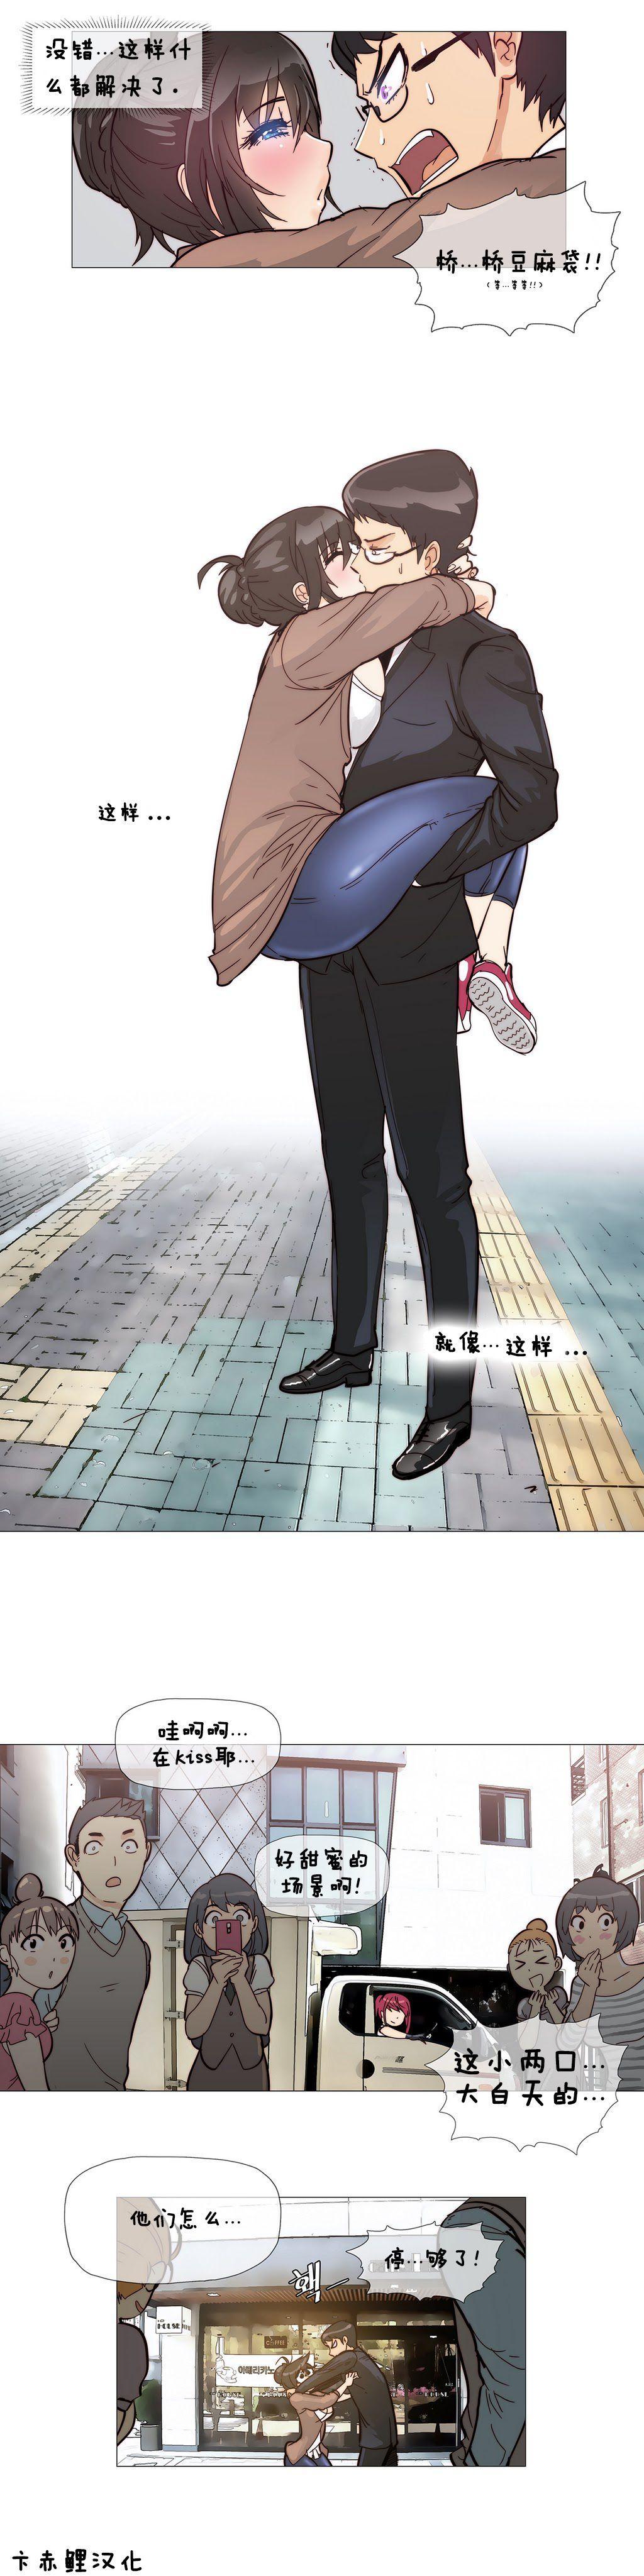 HouseHold Affairs 【卞赤鲤汉化】1~15话 89